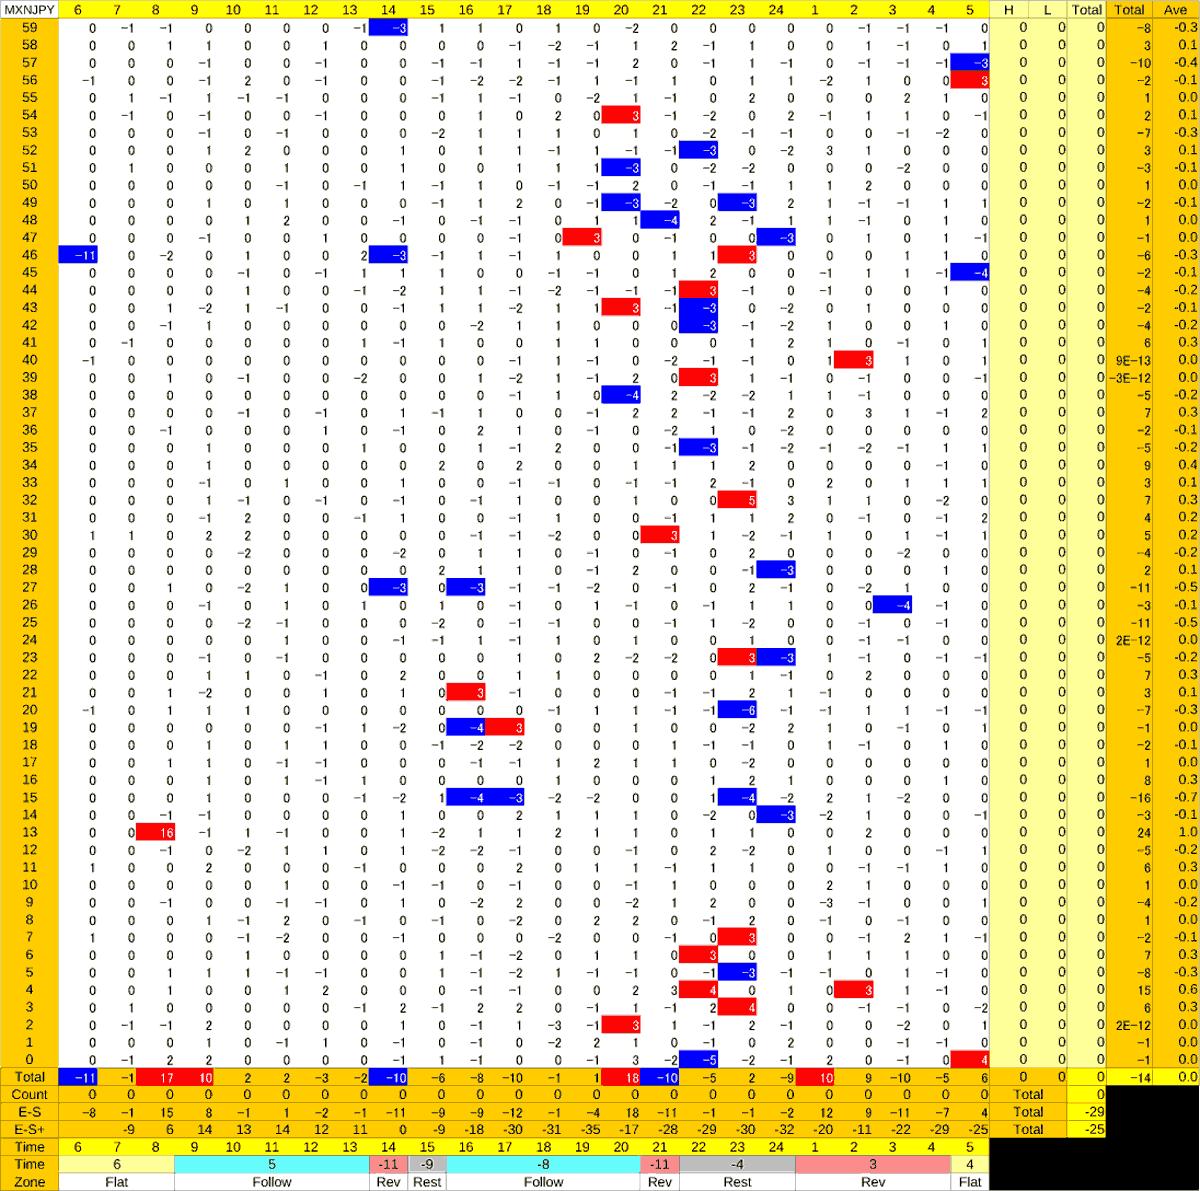 20200730_HS(3)MXNJPY